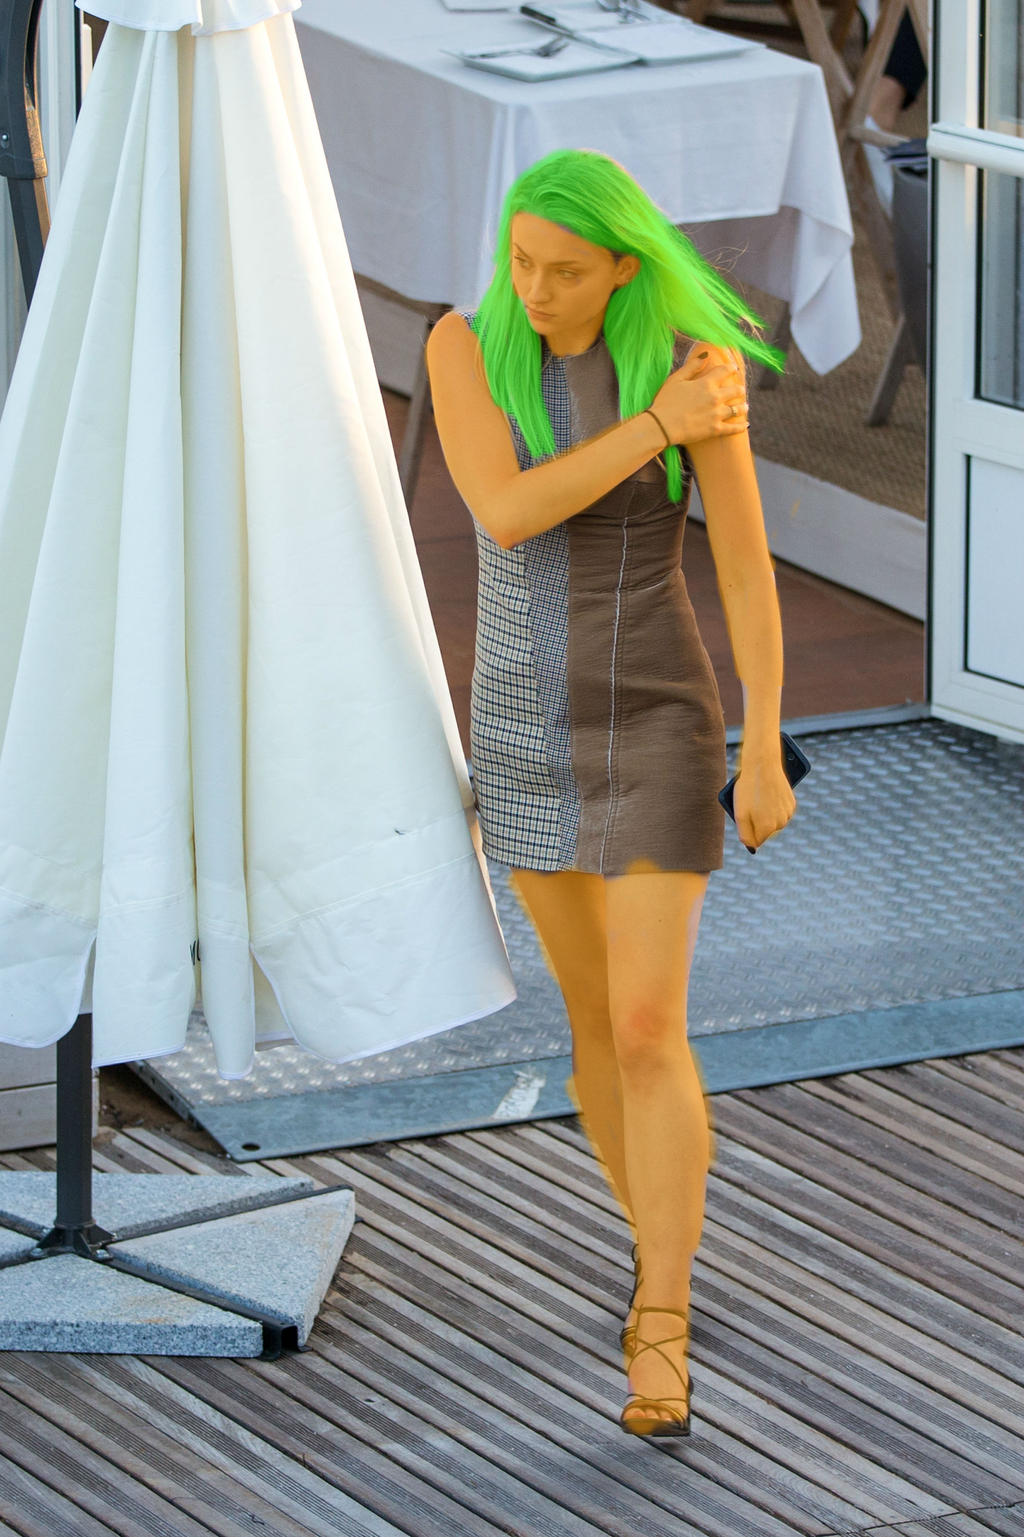 Loompa Girl Sophie Turner by scotishjoker1edits